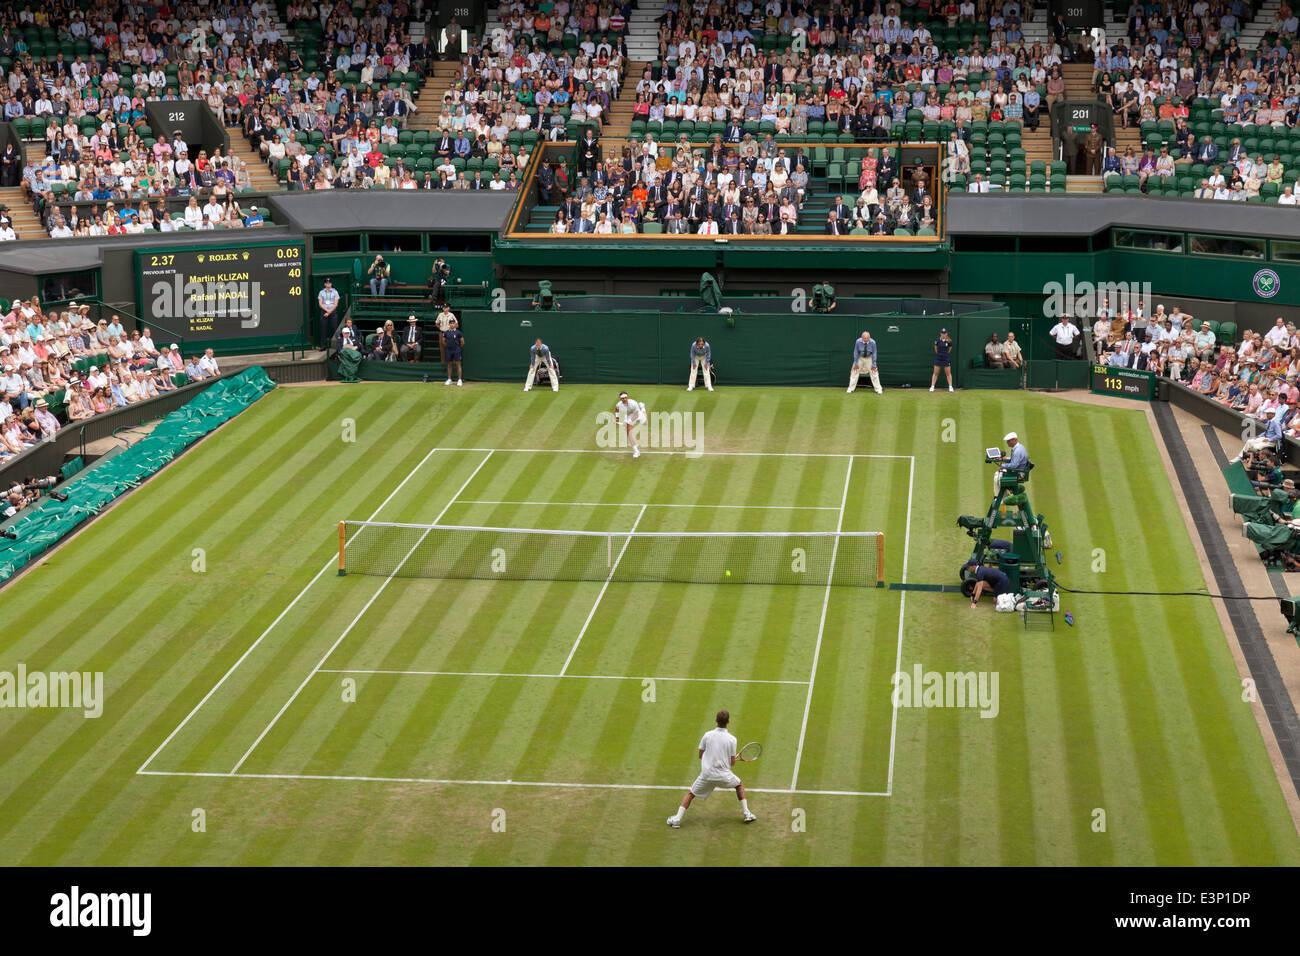 Campo centrale di Wimbledon Mens Singles, 1° round, 2014 Campionati, Wimbledon Lawn Tennis Club, Londra Inghilterra Immagini Stock